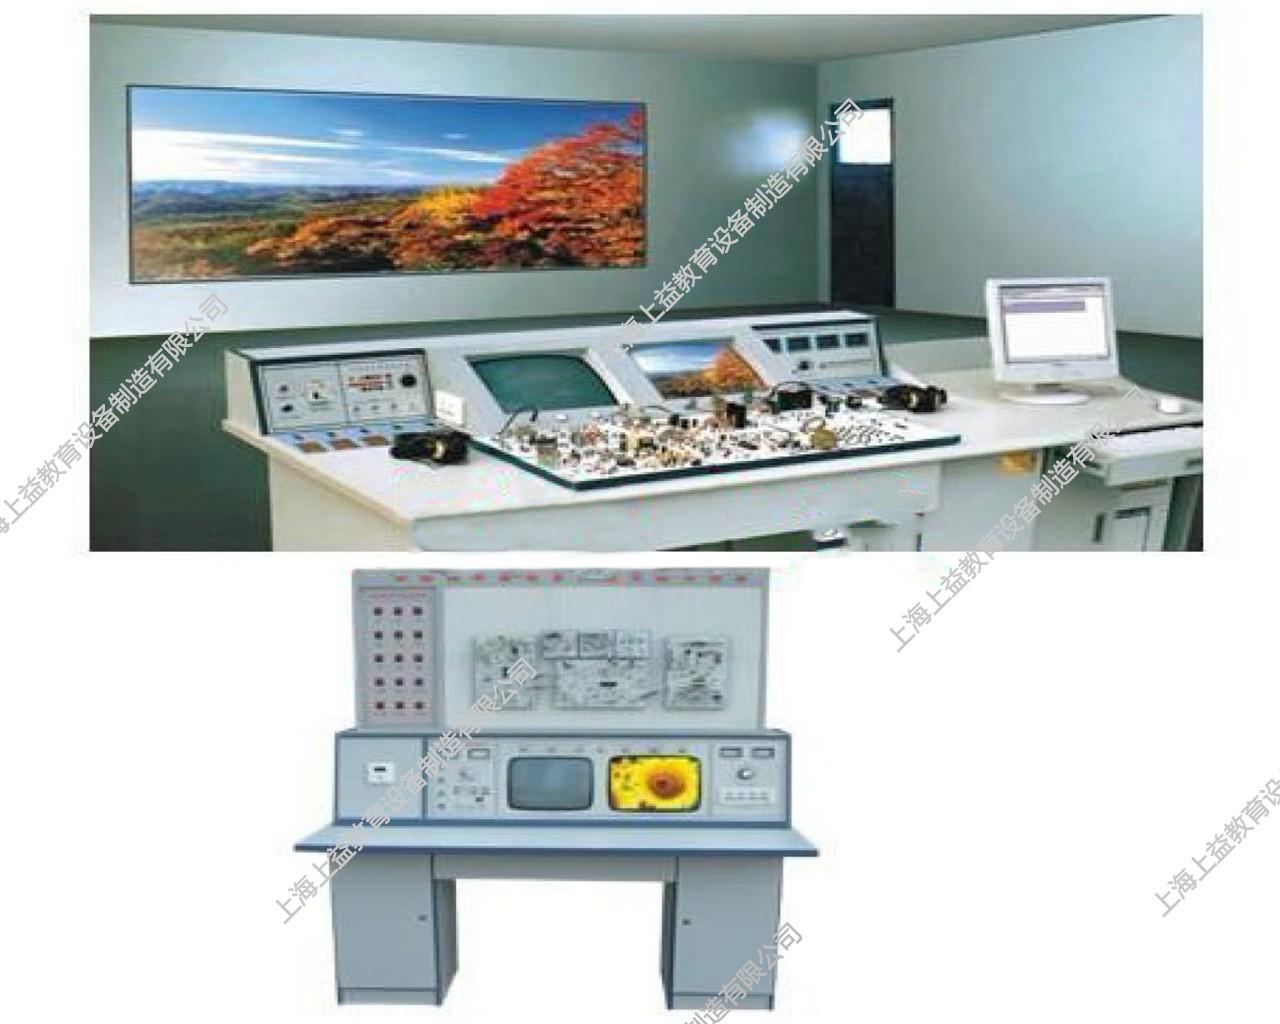 SYJYD-15家电音视频维修技能wwwlehu8viplehu68vip装置